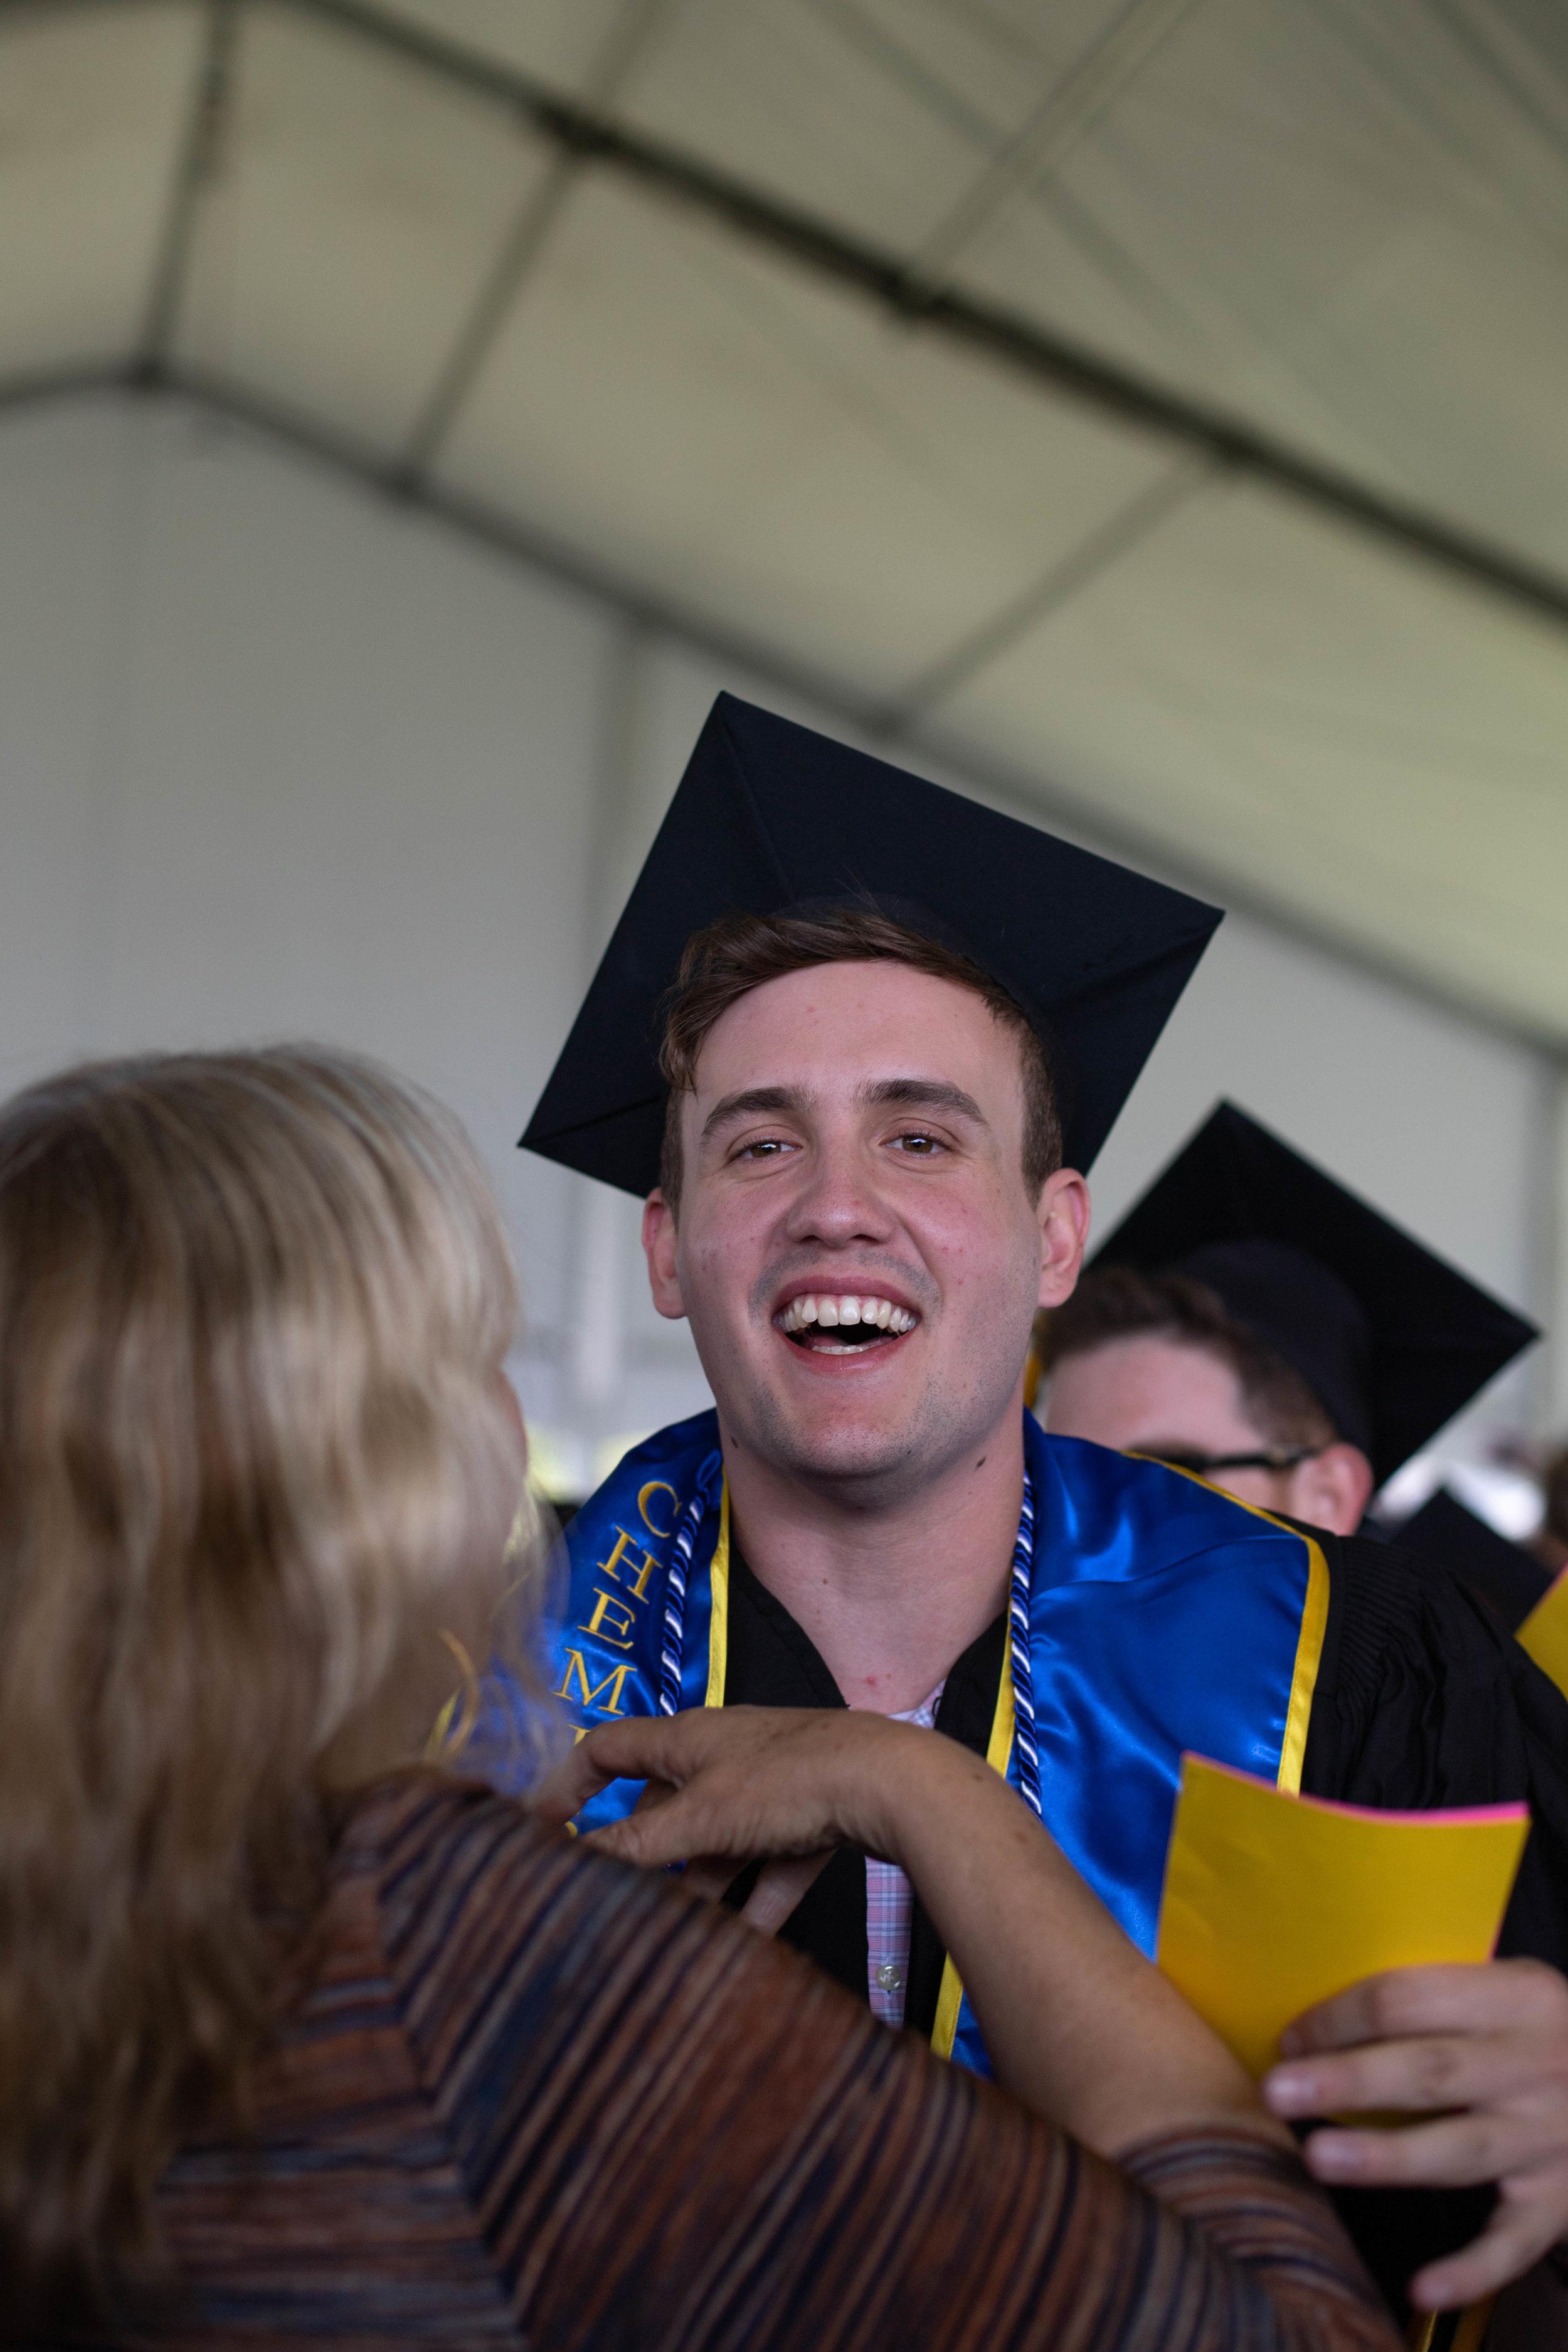 2019-06-15_Keith_Graduation_018.jpg